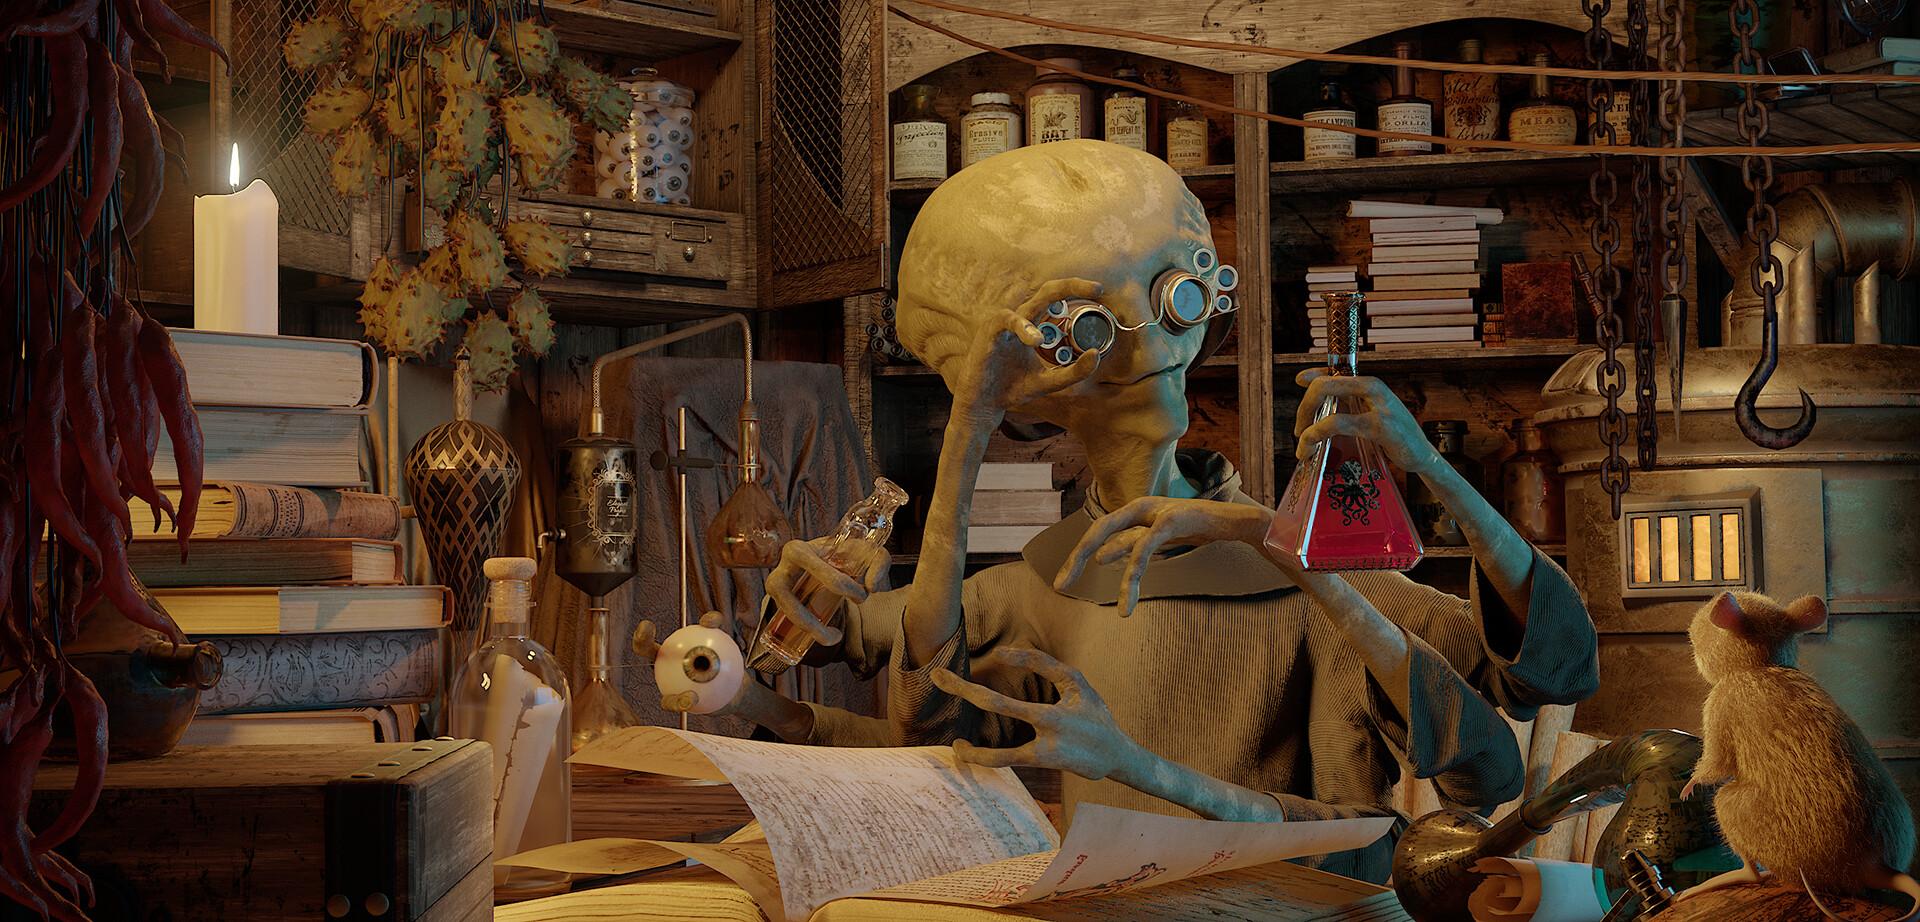 The Alchemist - Peshang Ahmed